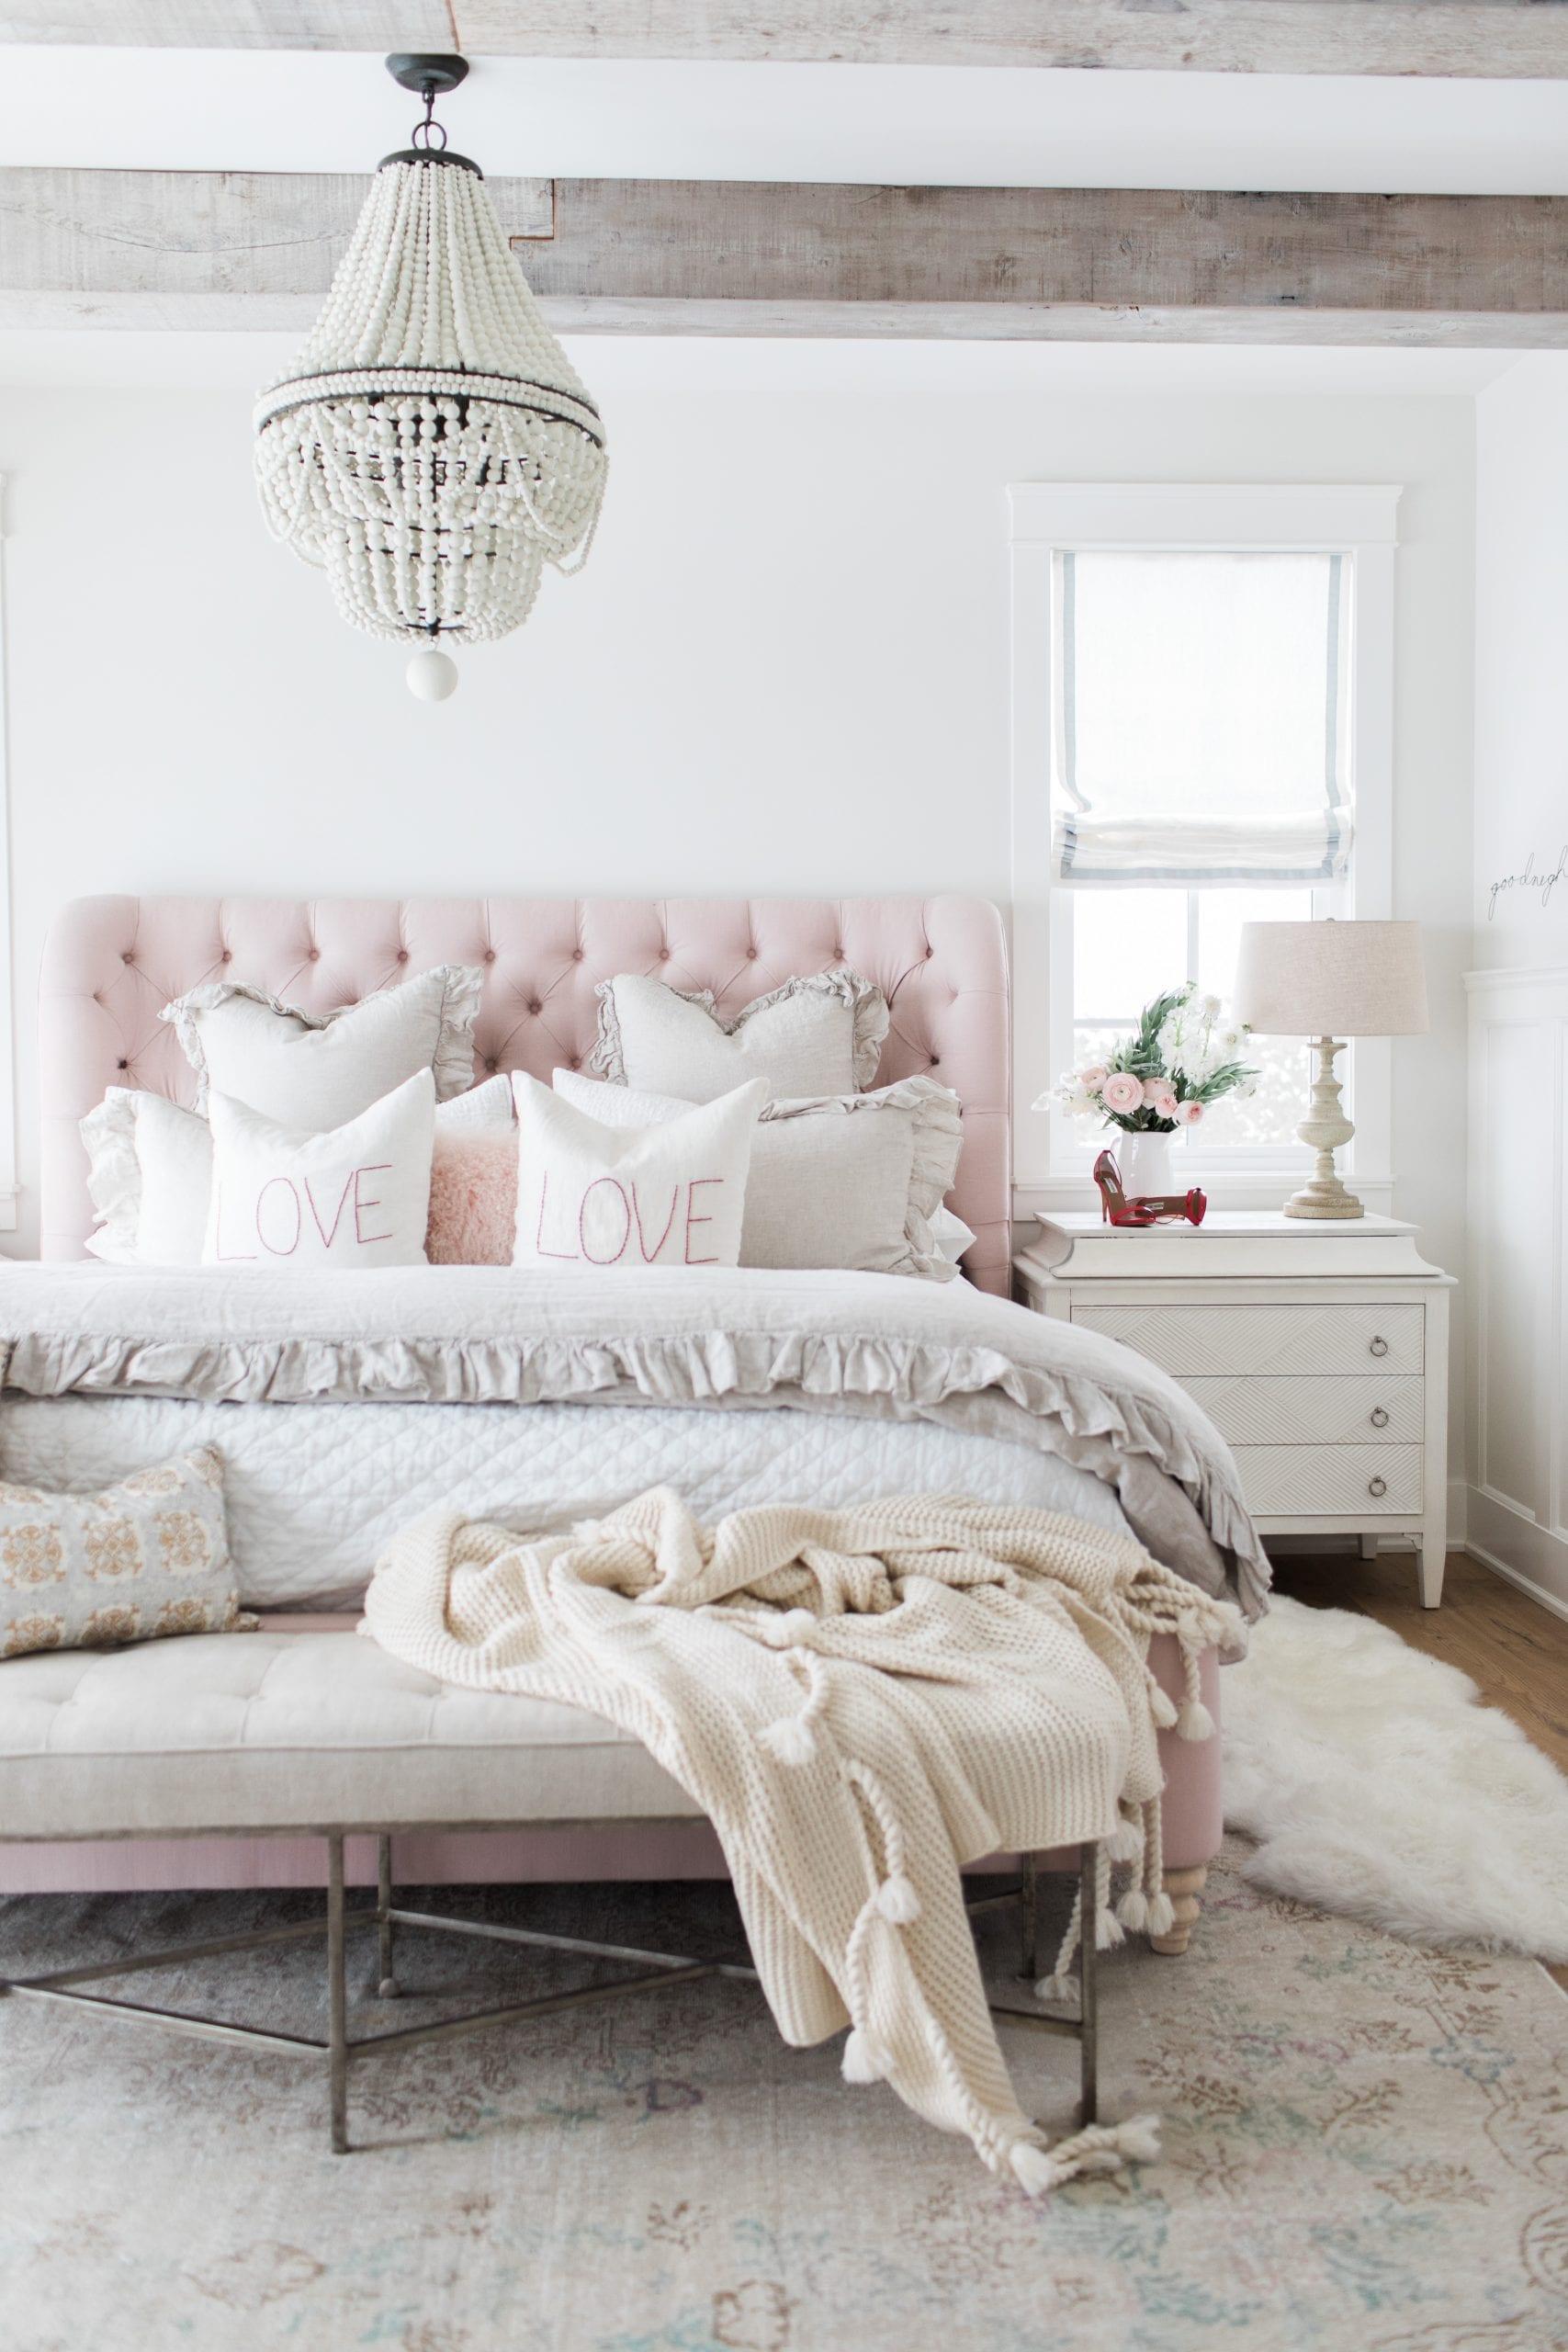 Best Bedroom Decor 2021 Finds